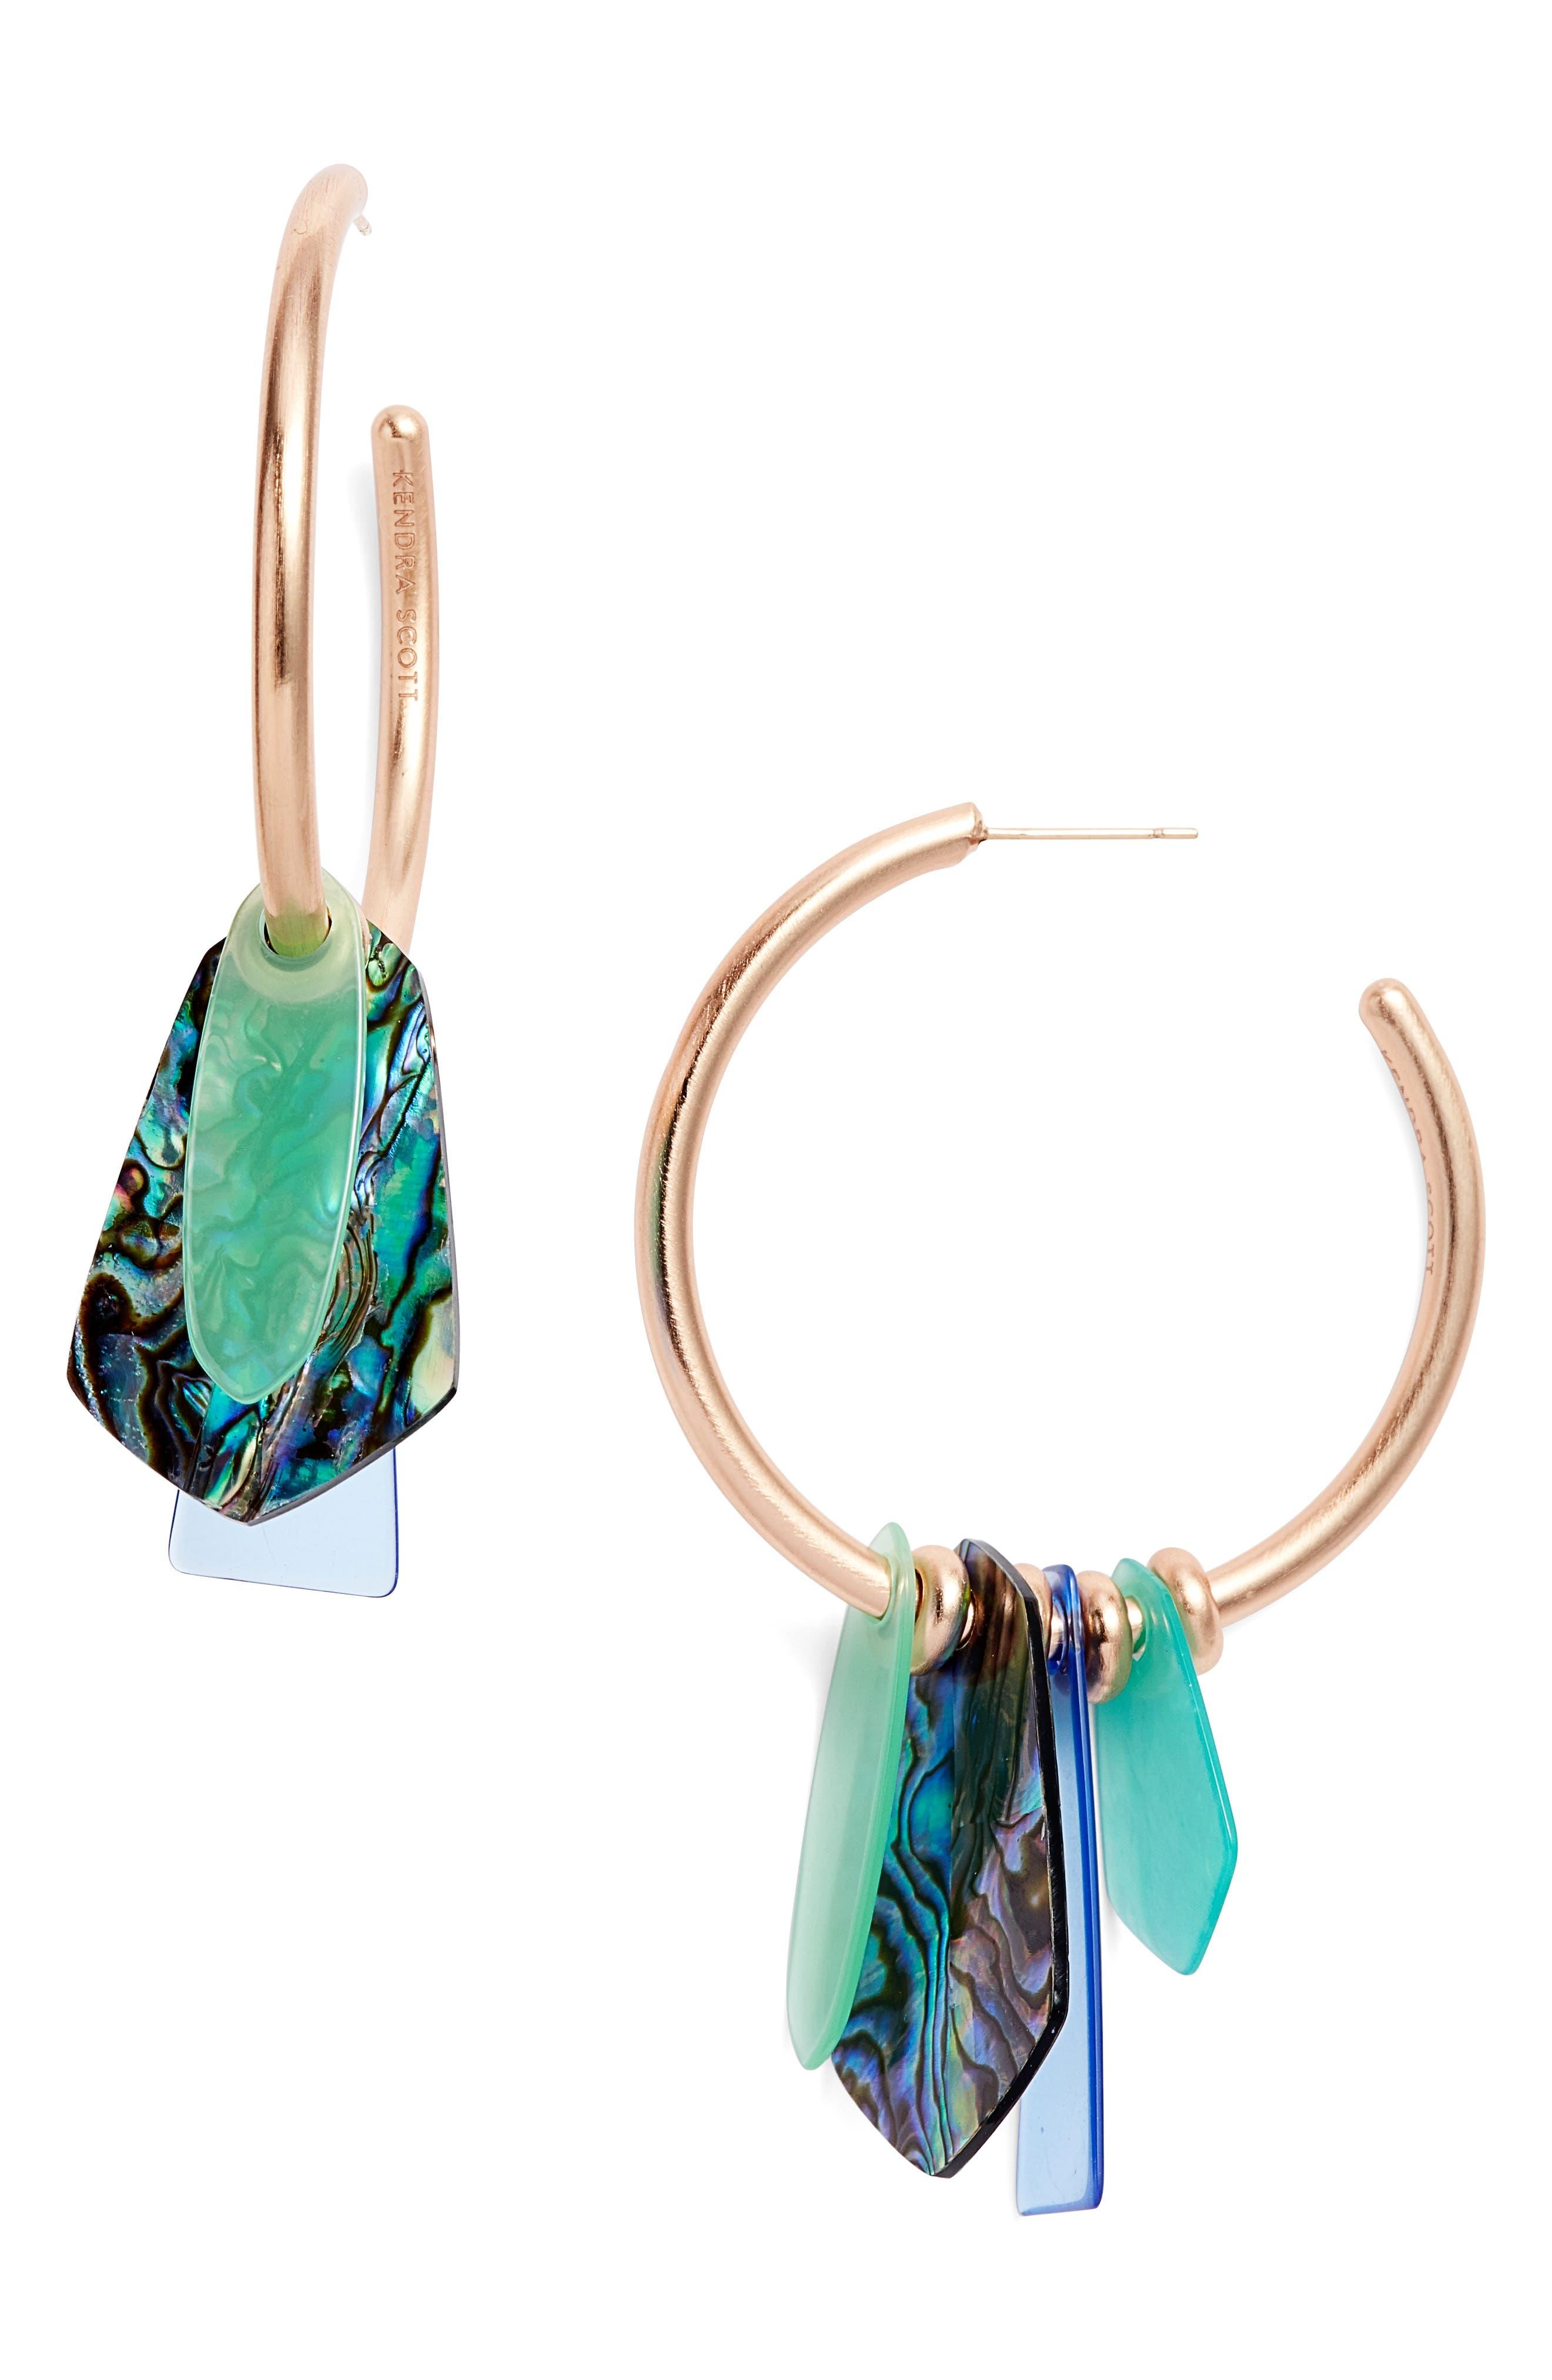 KENDRA SCOTT, Gaby Hoop Earrings, Main thumbnail 1, color, ABALONE MIX/ ROSE GOLD